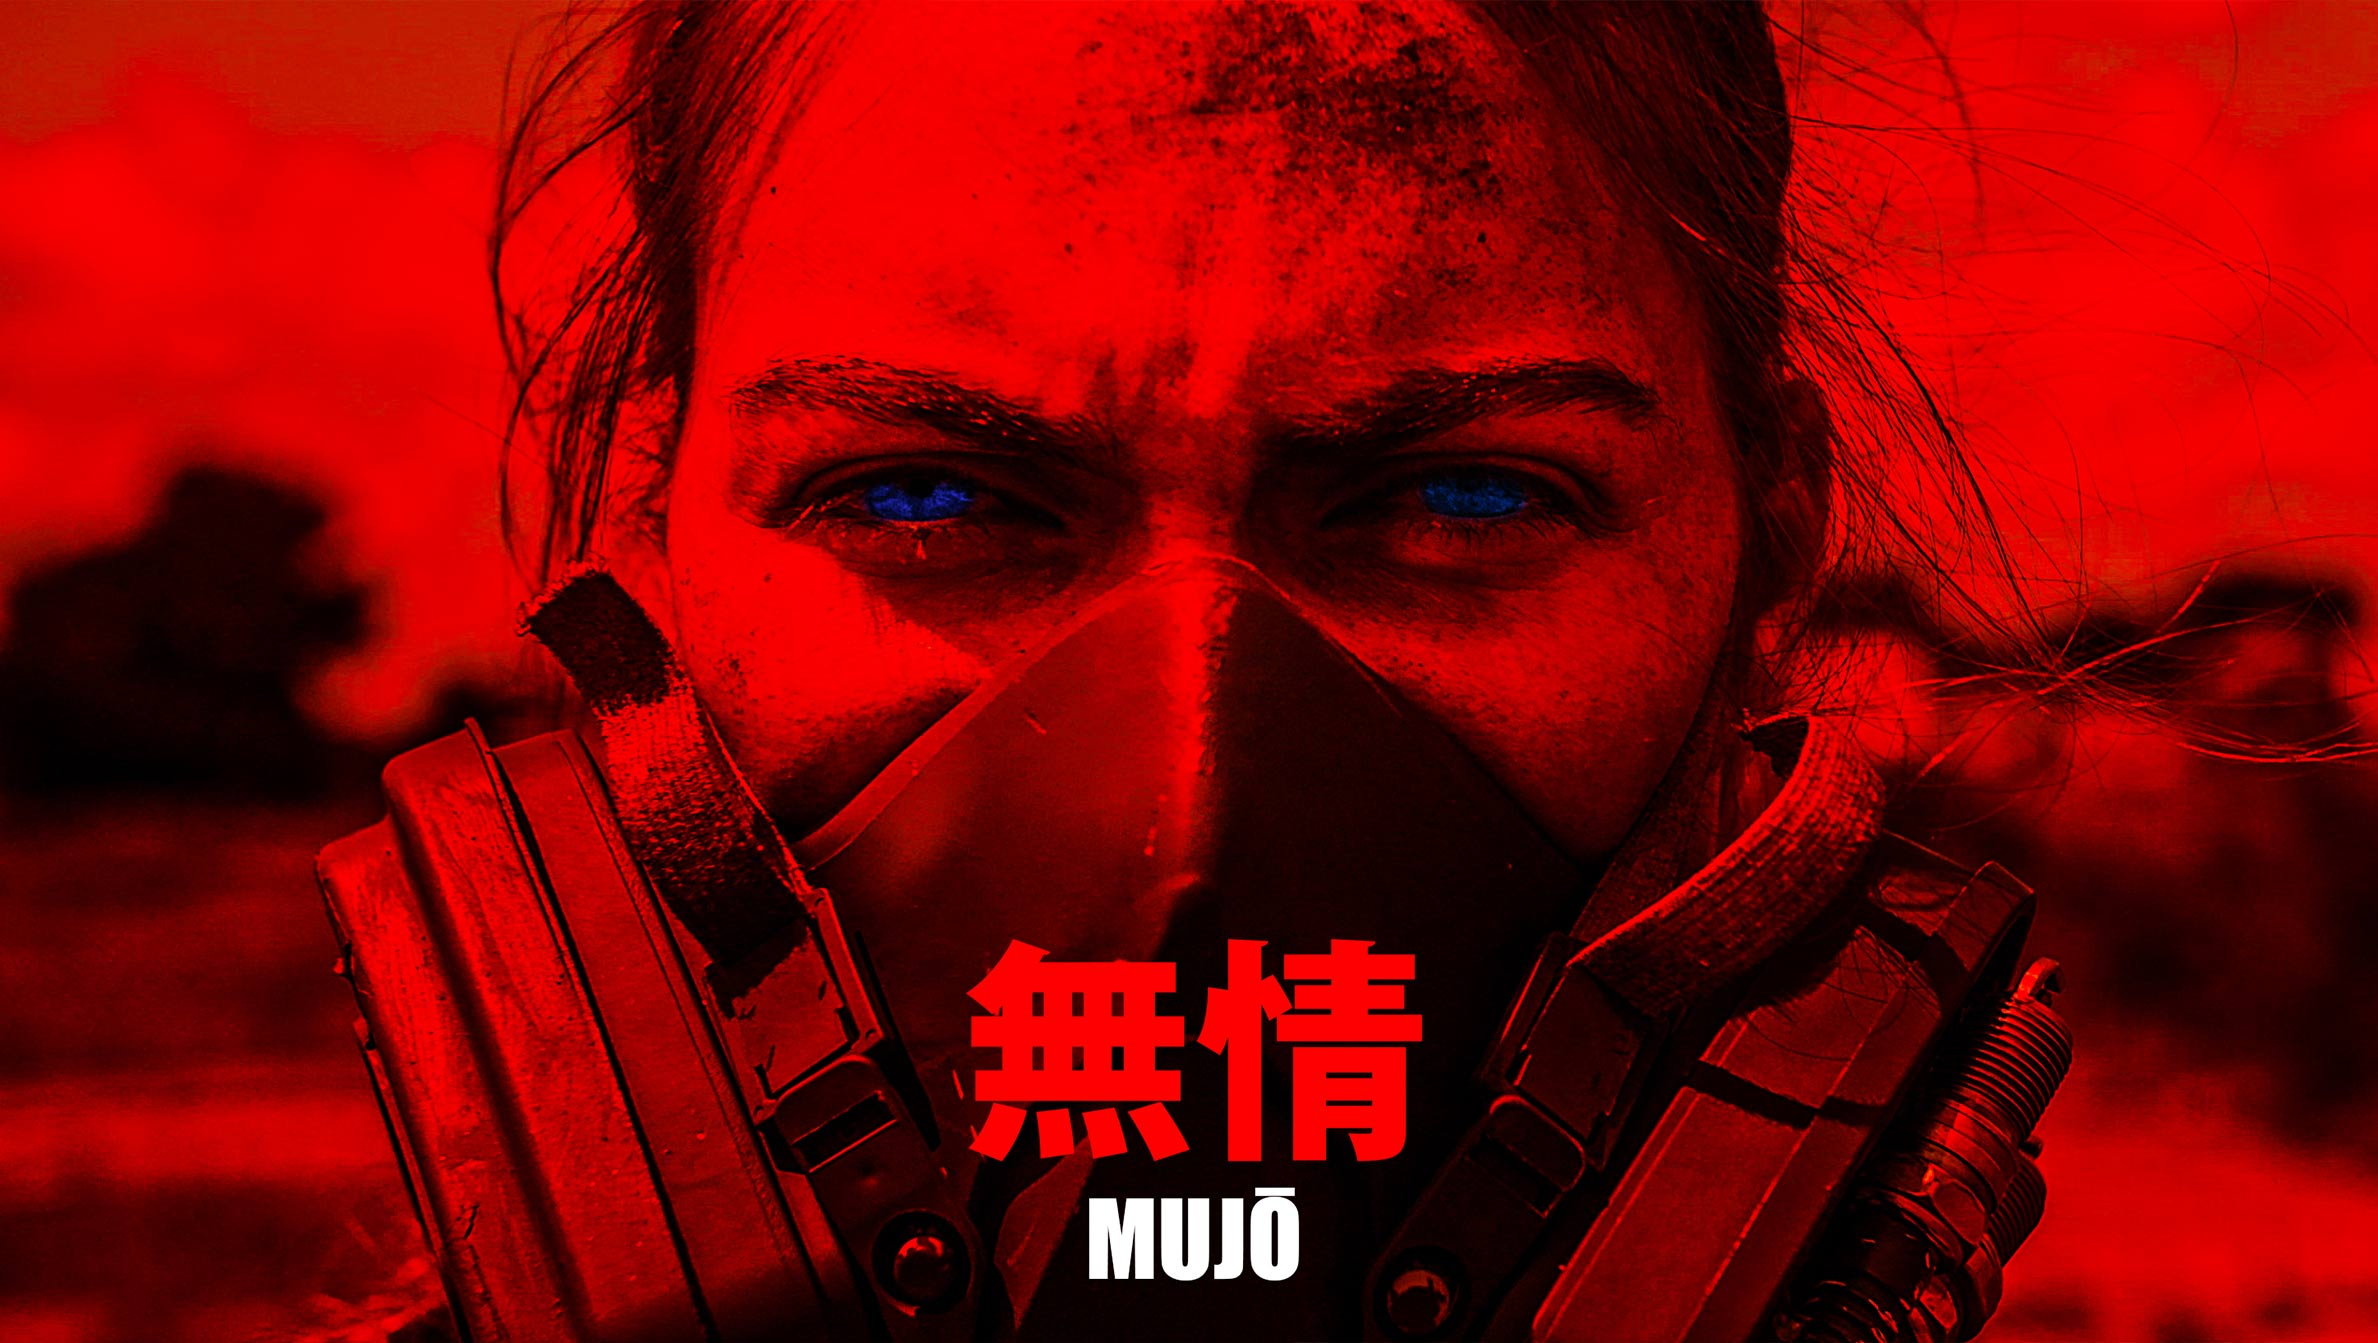 The story behind Mujō